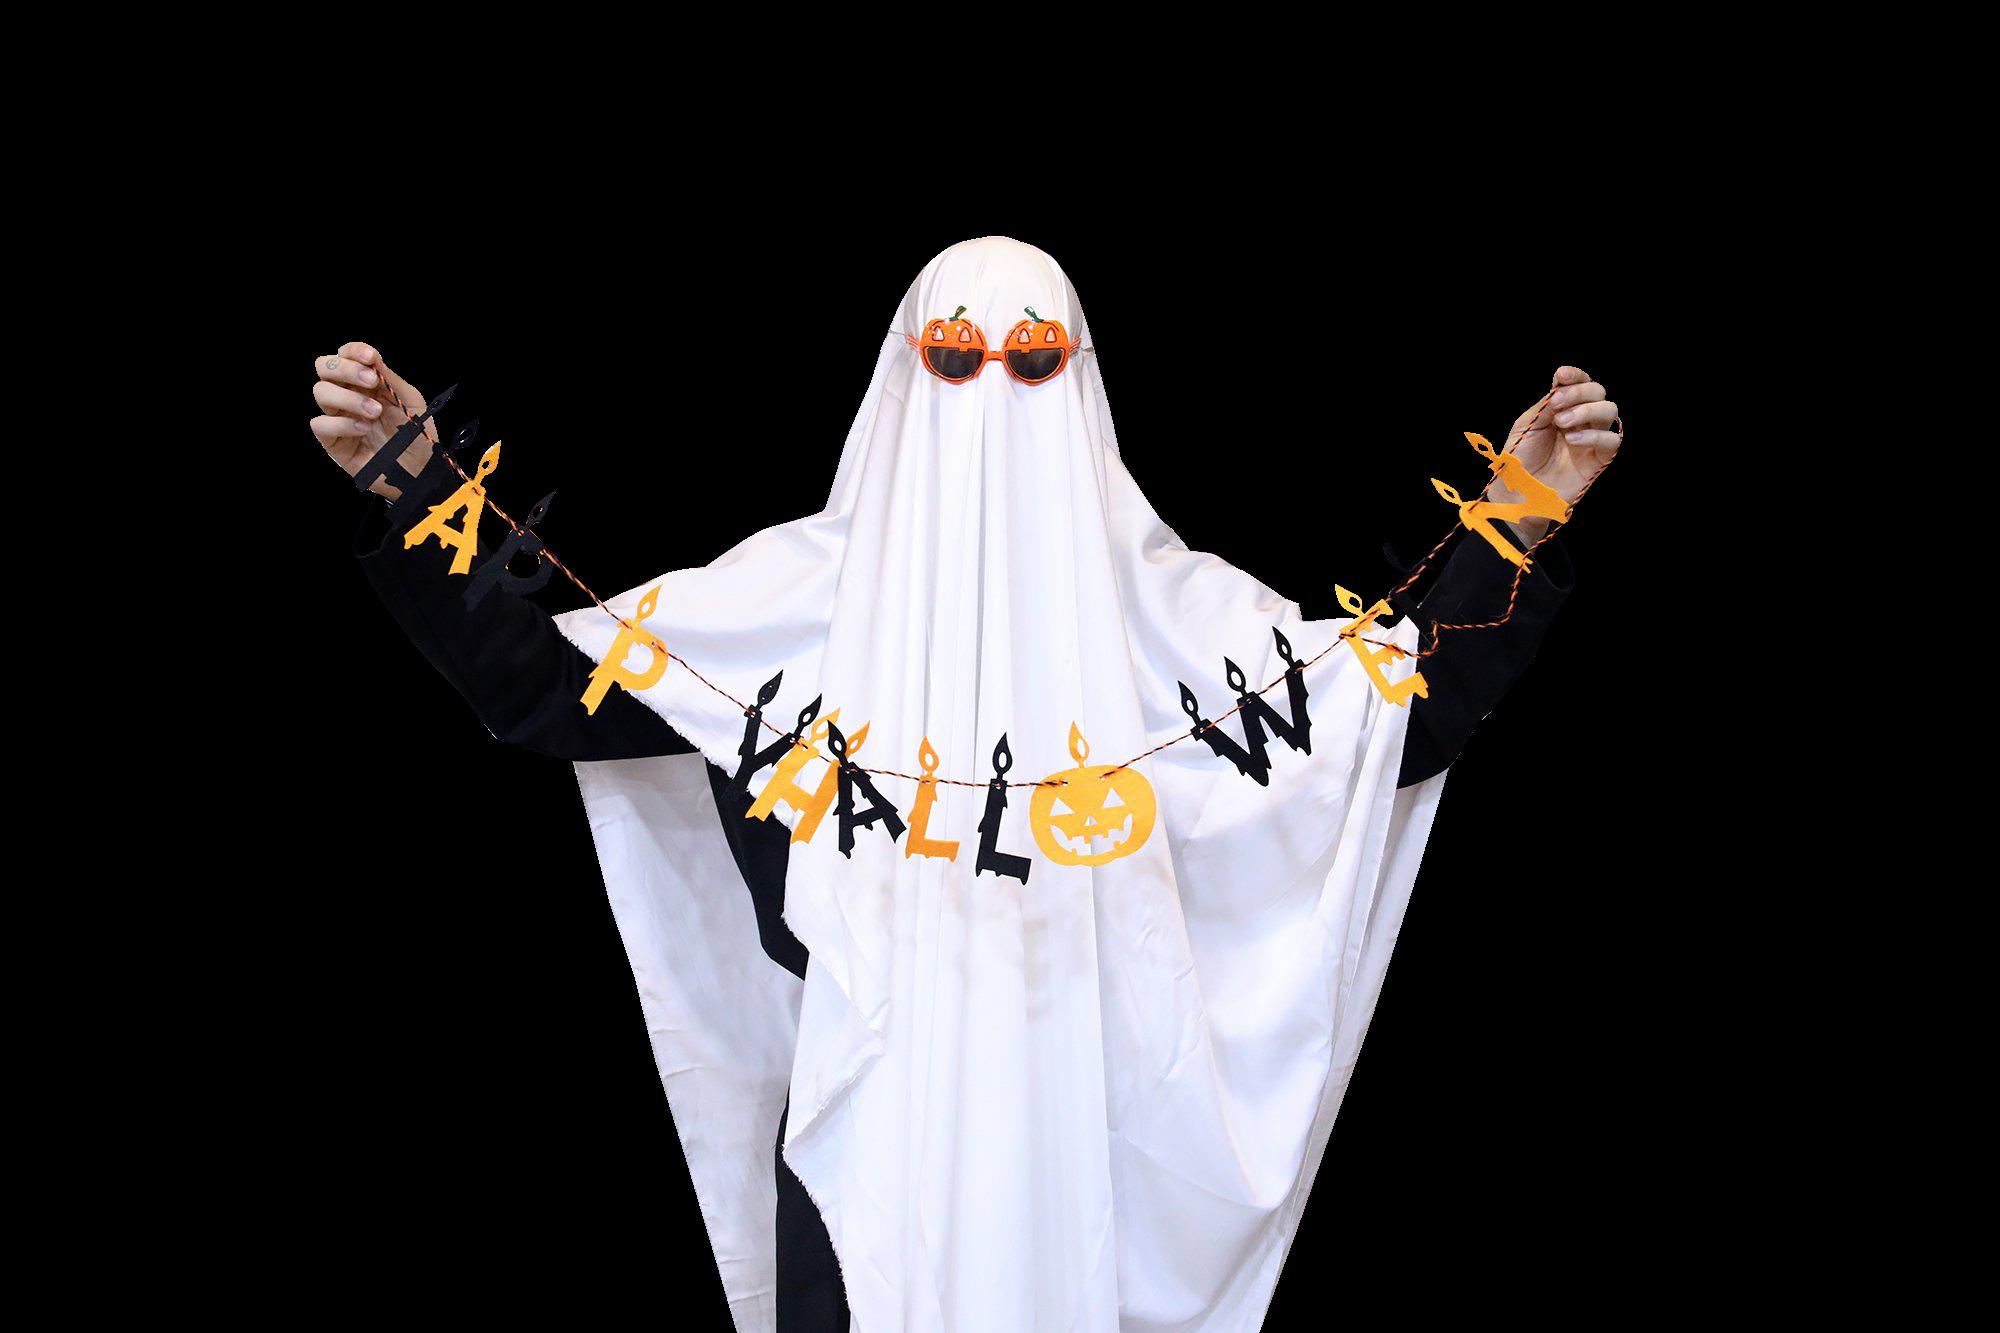 Jungkook (BTS) (Weverse Halloween 2020) by  BEAPANDA